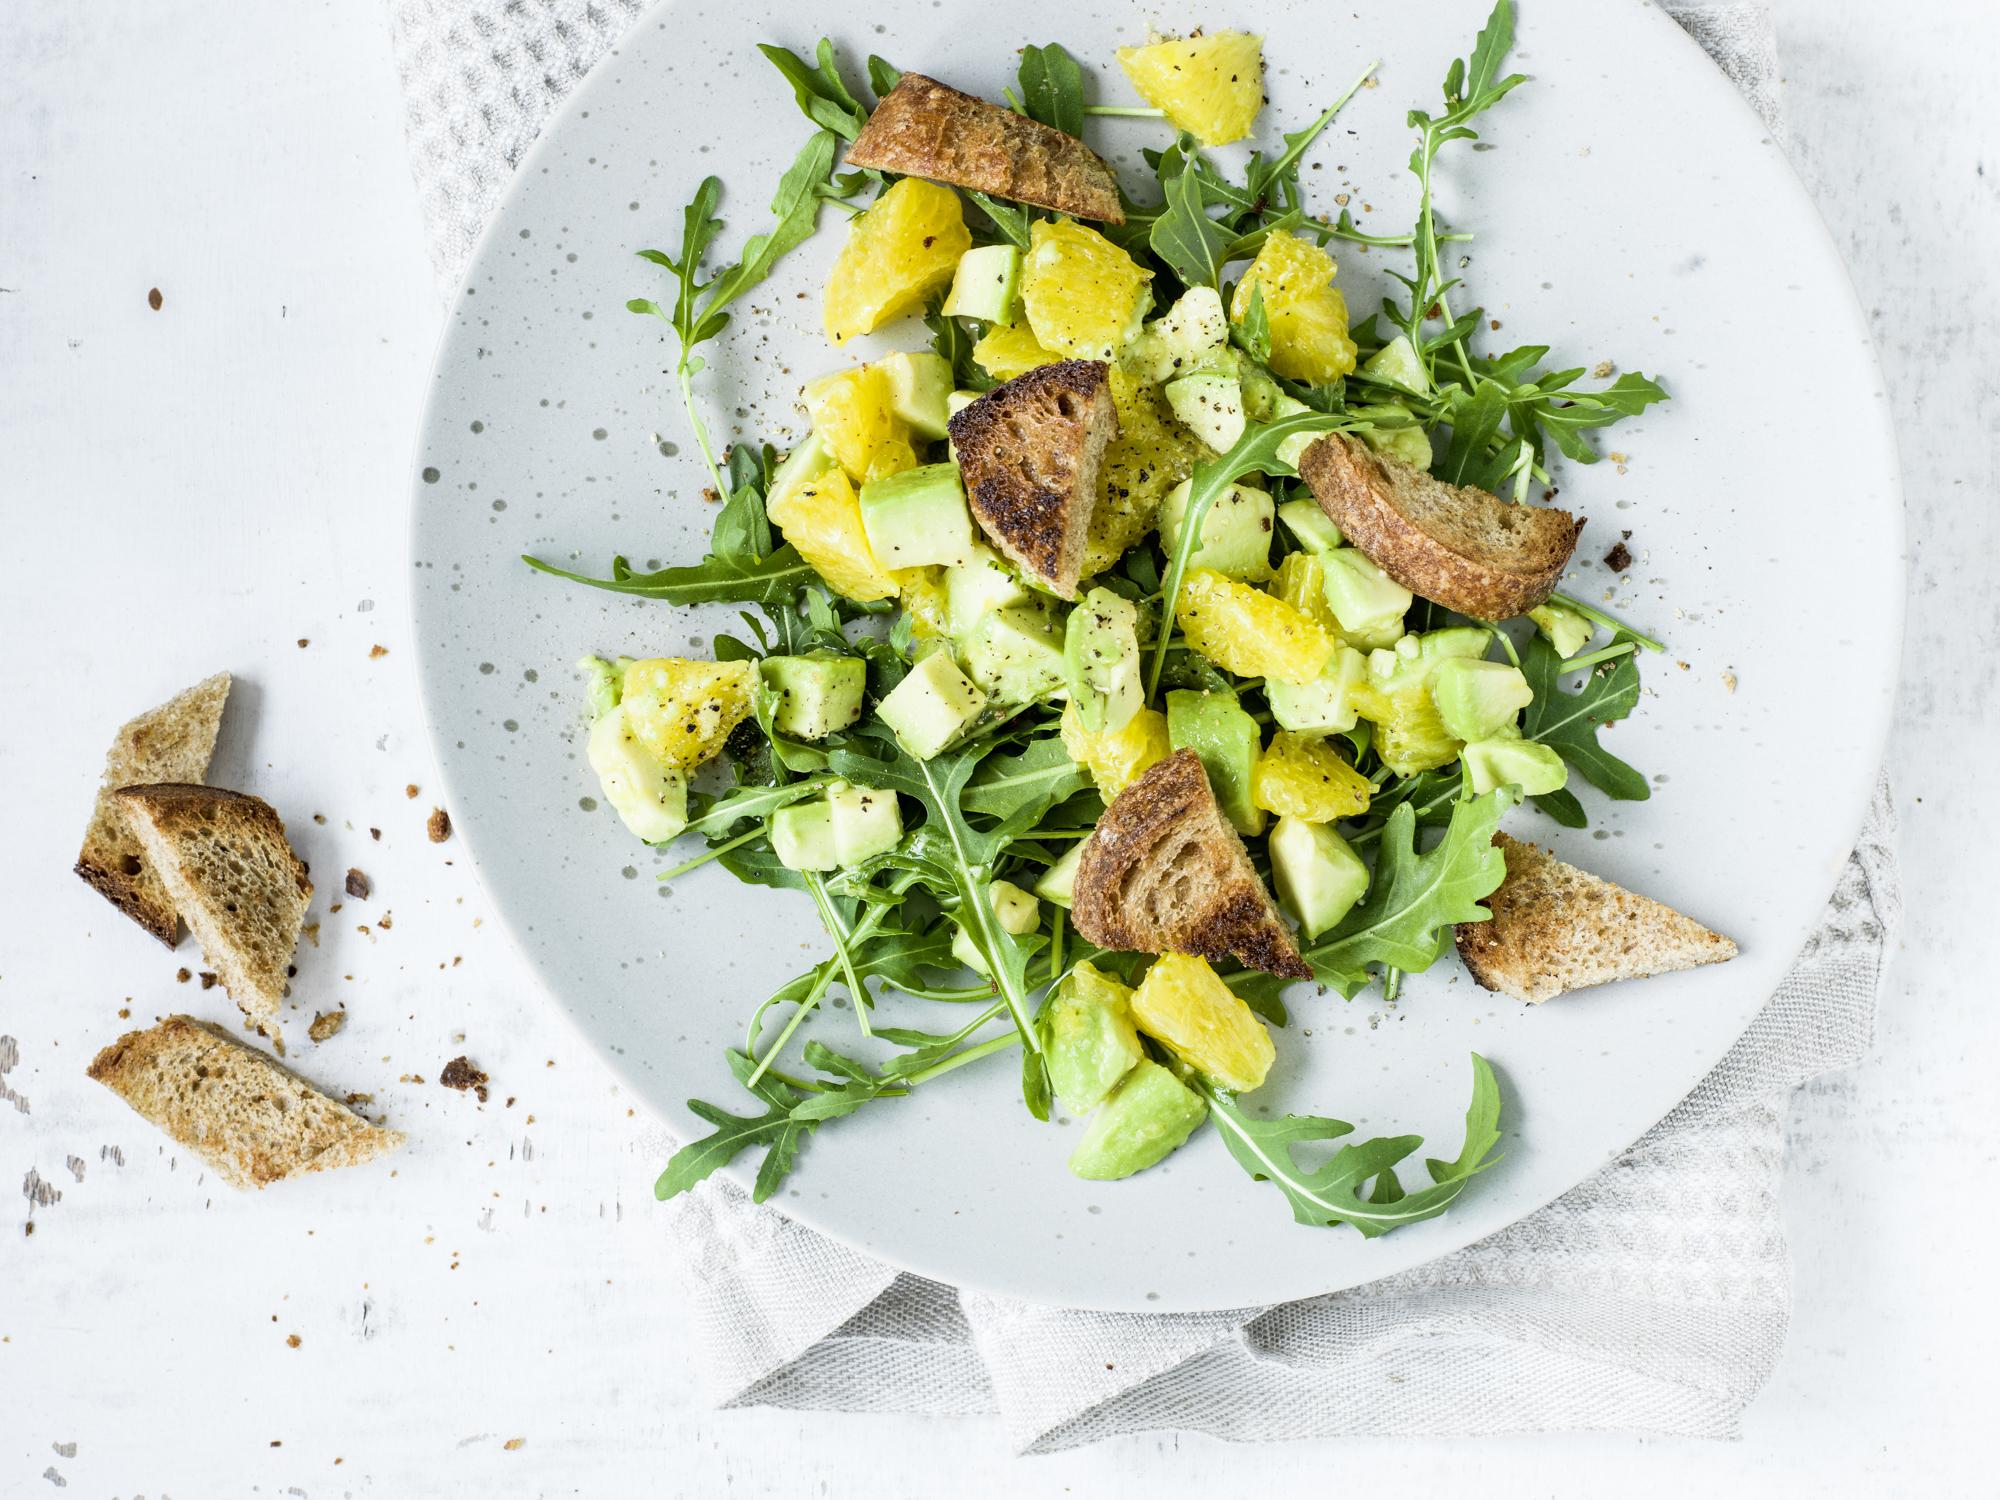 Food-Fotografie Microgreens, Stefan Schmidlin Fotograf Basel; Bild 17.jpg